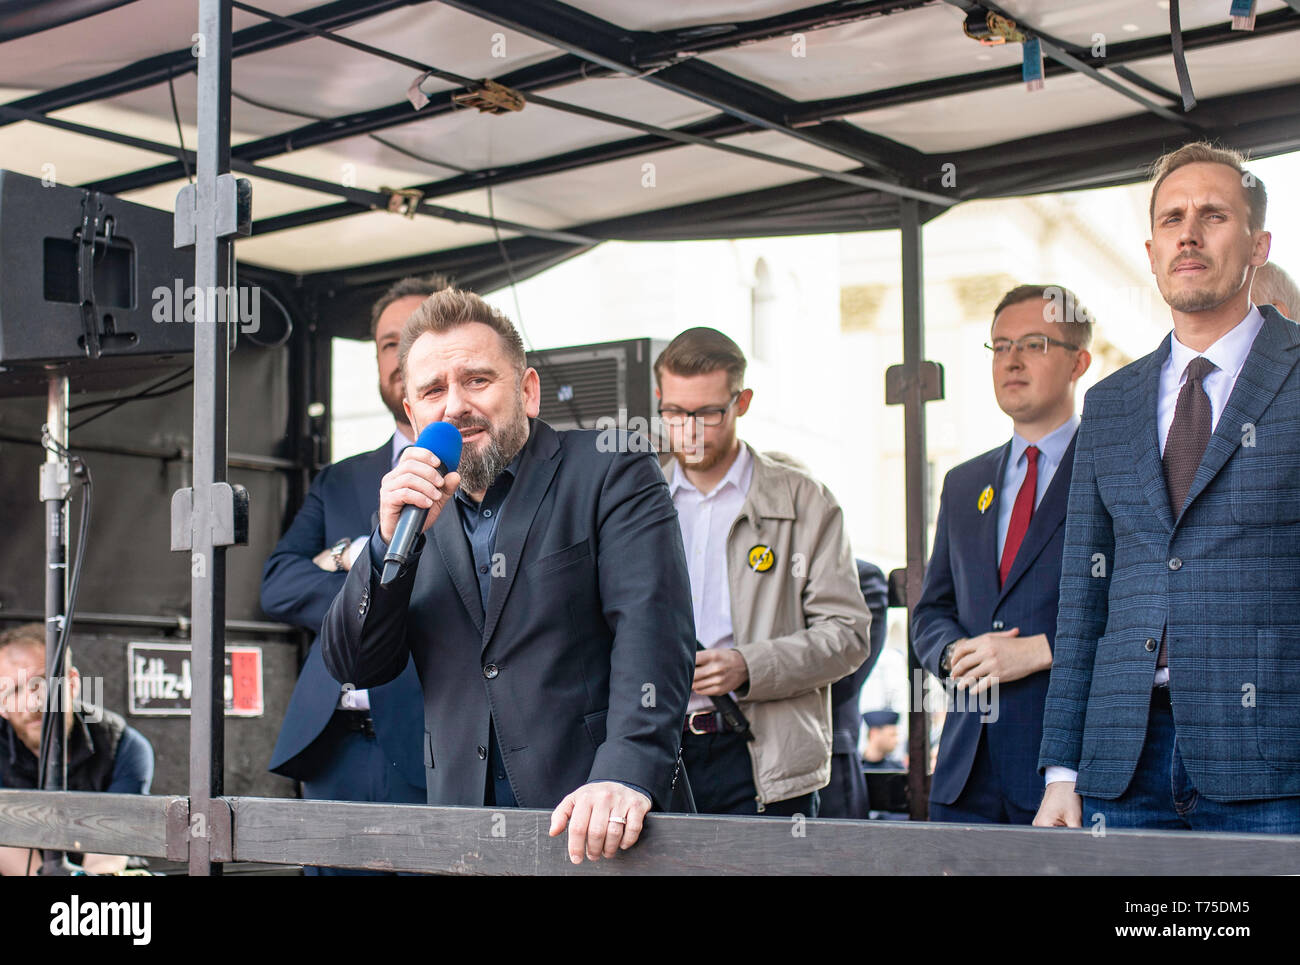 Varsovie / Pologne: (Konfederacja nationalistes KORWiN Braun Liroy Narodowcy) manifestant contre l'Union européenne. Photo Stock